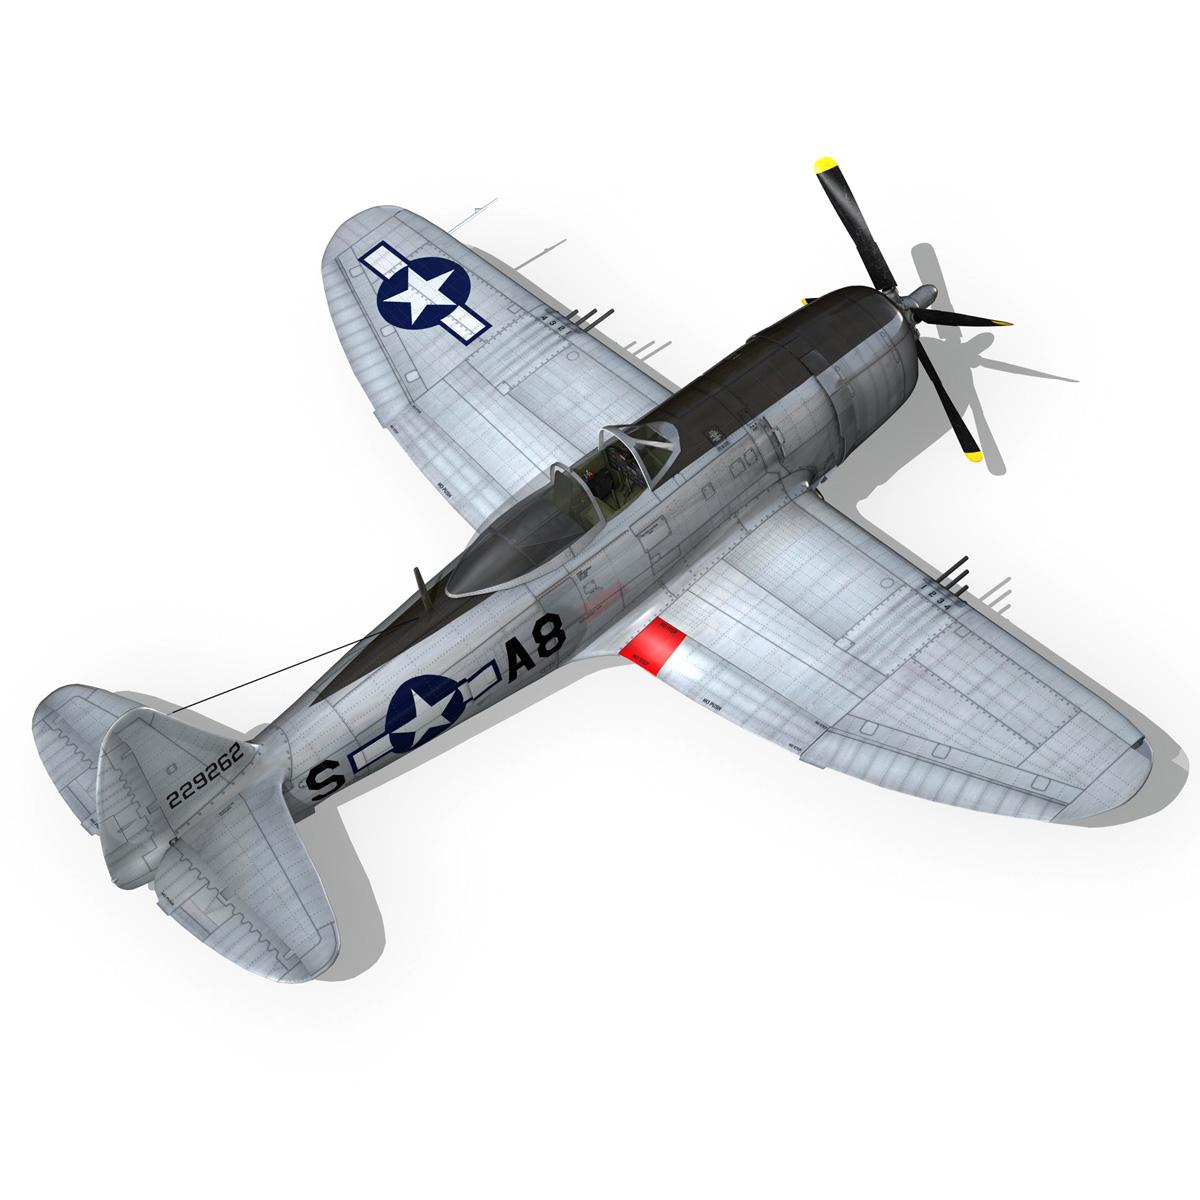 republic p-47 thunderbolt – daddy rabbit 3d model fbx c4d lwo obj 272699